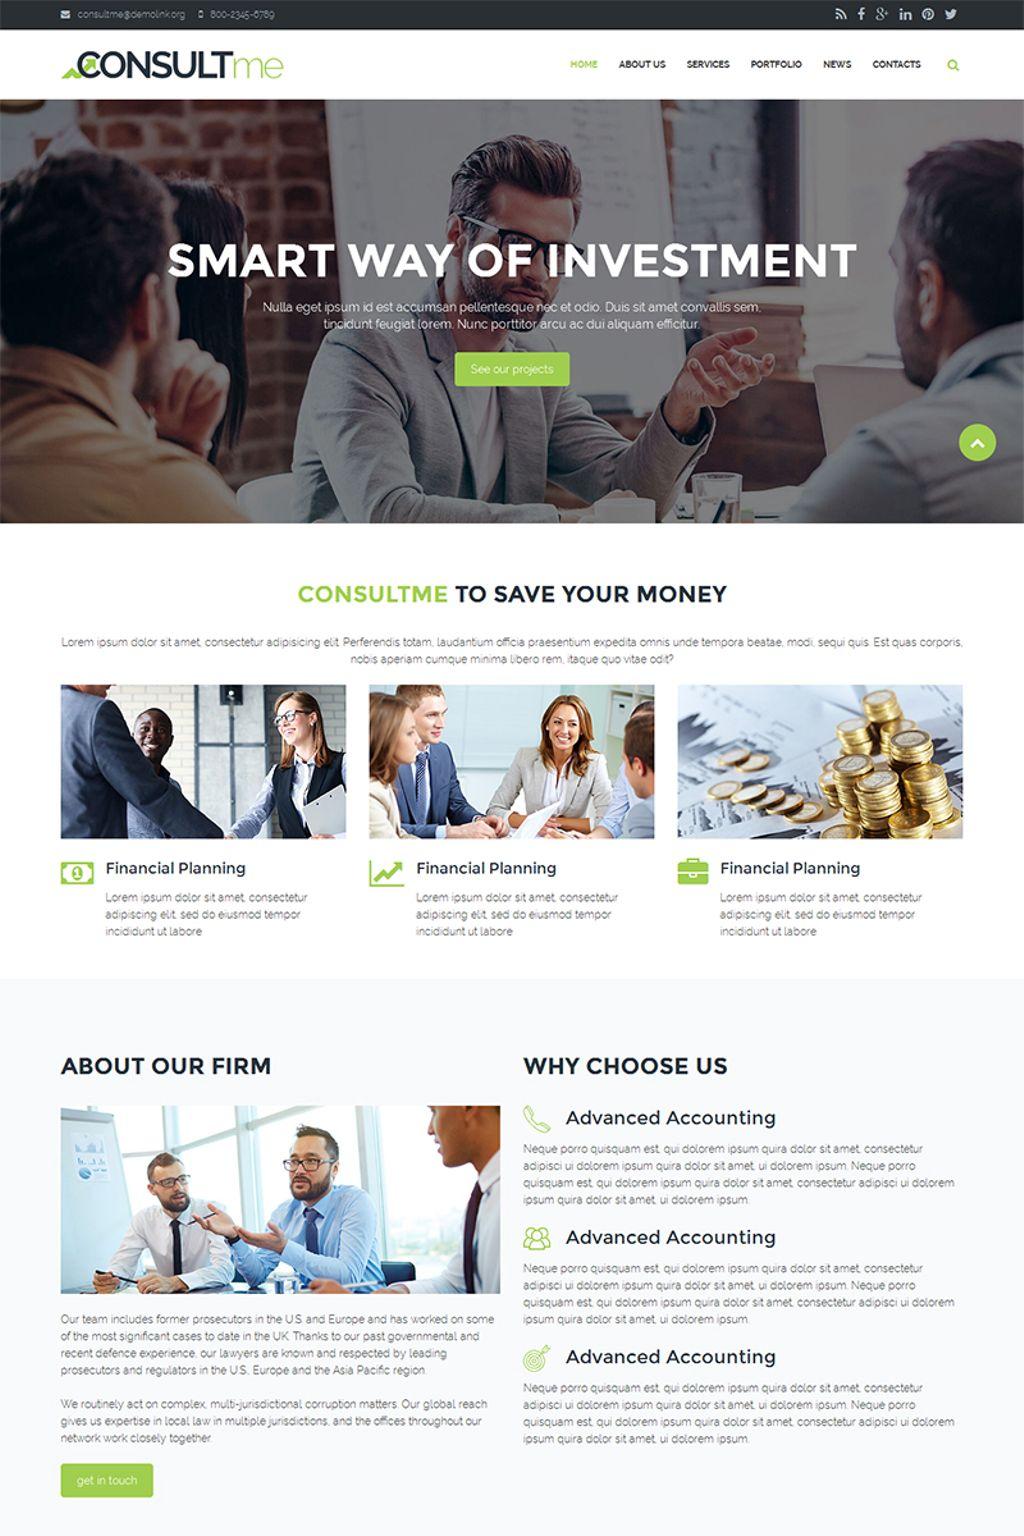 """Consultme - Consult Agency"" - Drupal шаблон №67192 - скріншот"